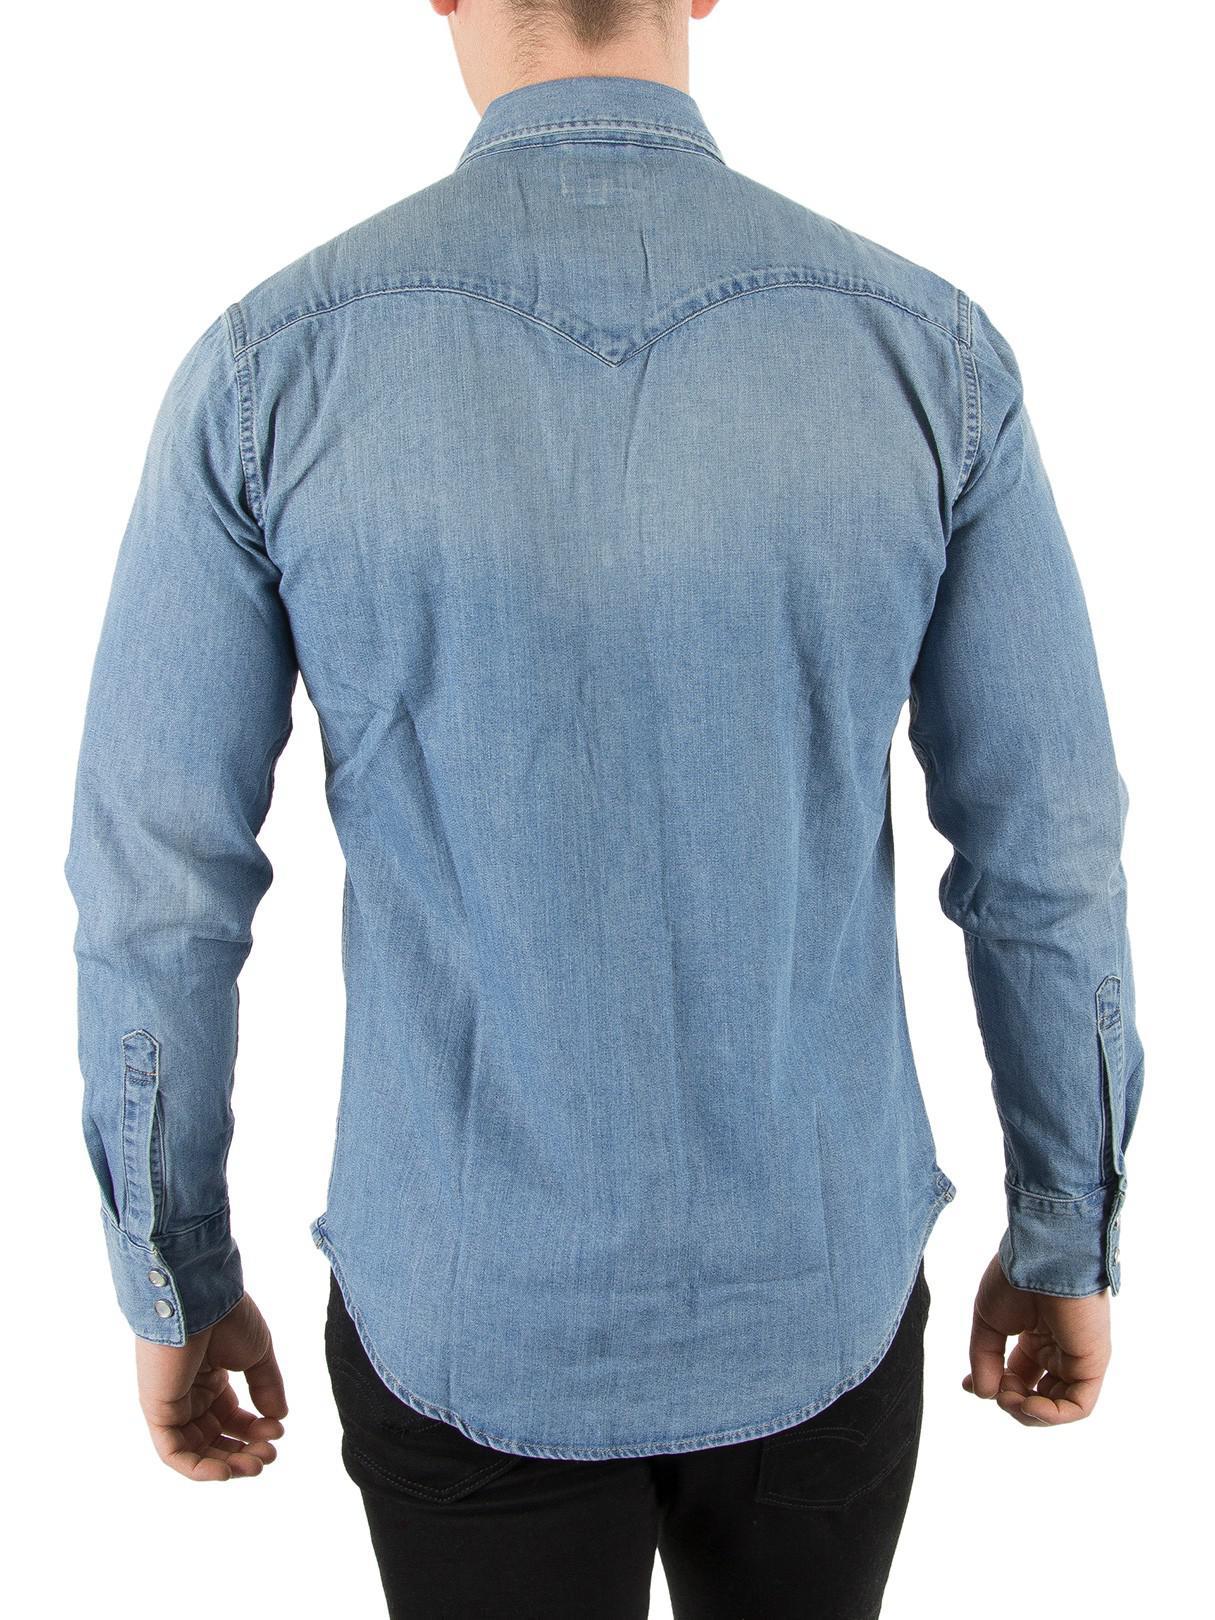 9b62cad9bd1 Levis® Long Sleeve Denim Shirt - BCD Tofu House